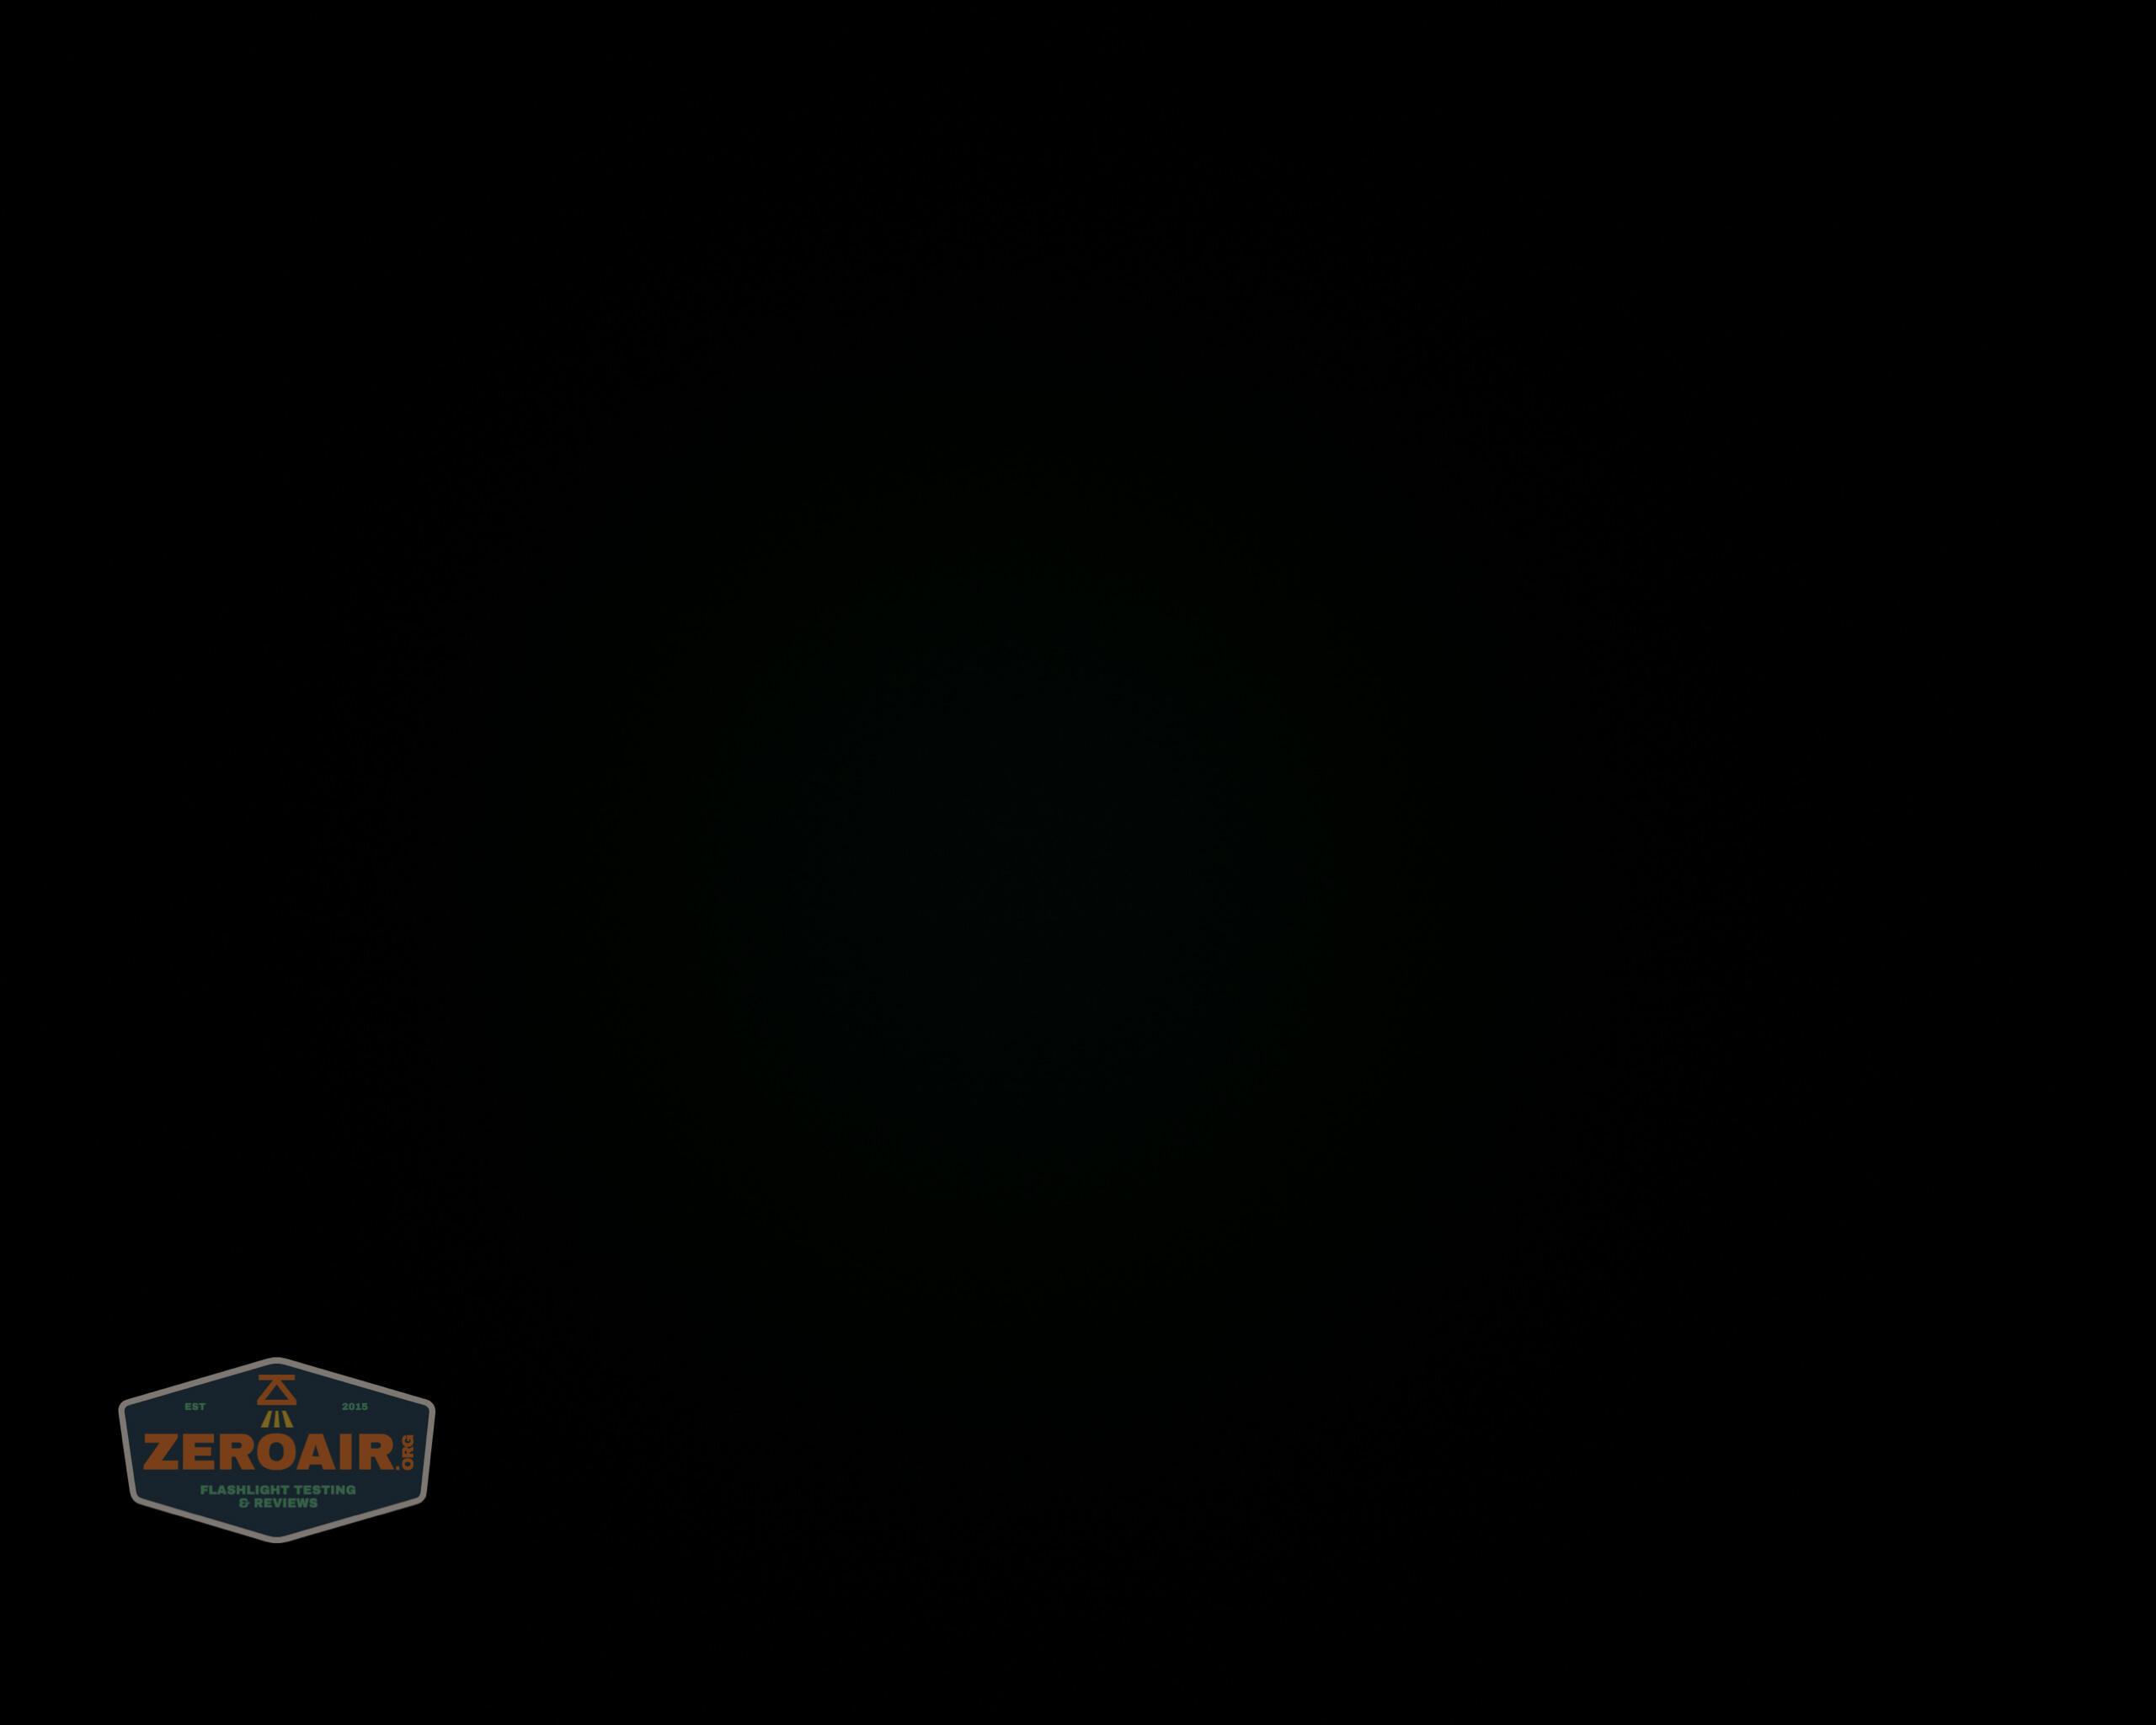 freasygears cyansky m3 titanium pocket flashlight beamshot ceiling 1